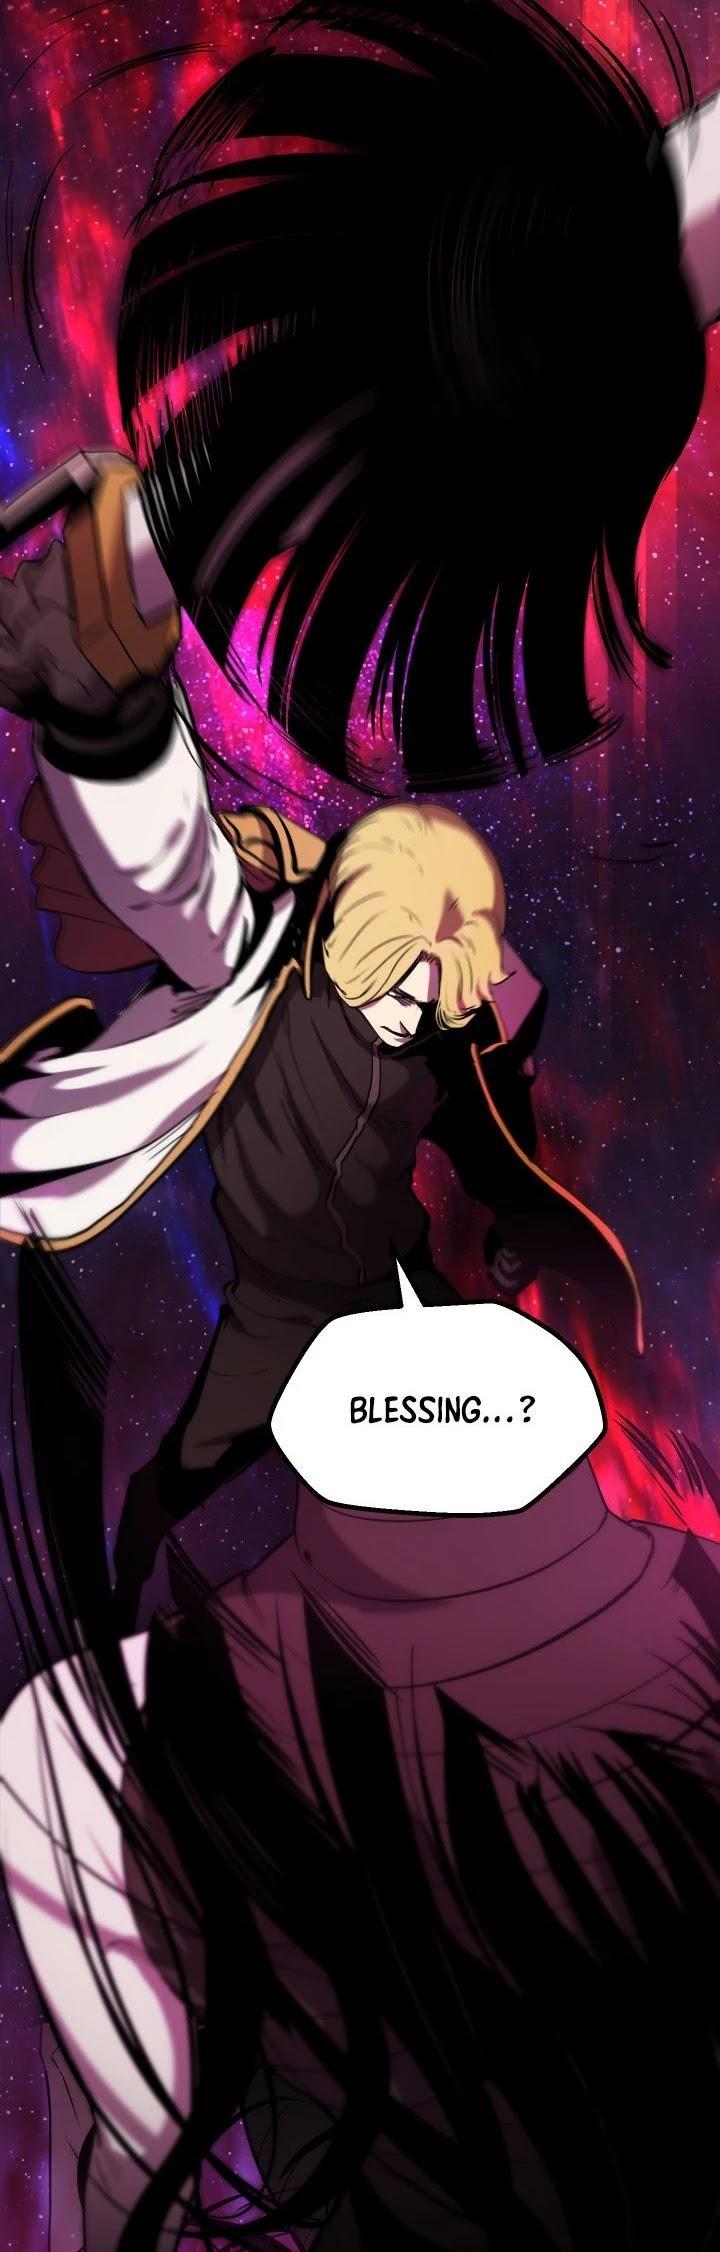 Survival Story Of A Sword King In A Fantasy World Chapter 50: End Season 1 page 3 - Mangakakalots.com